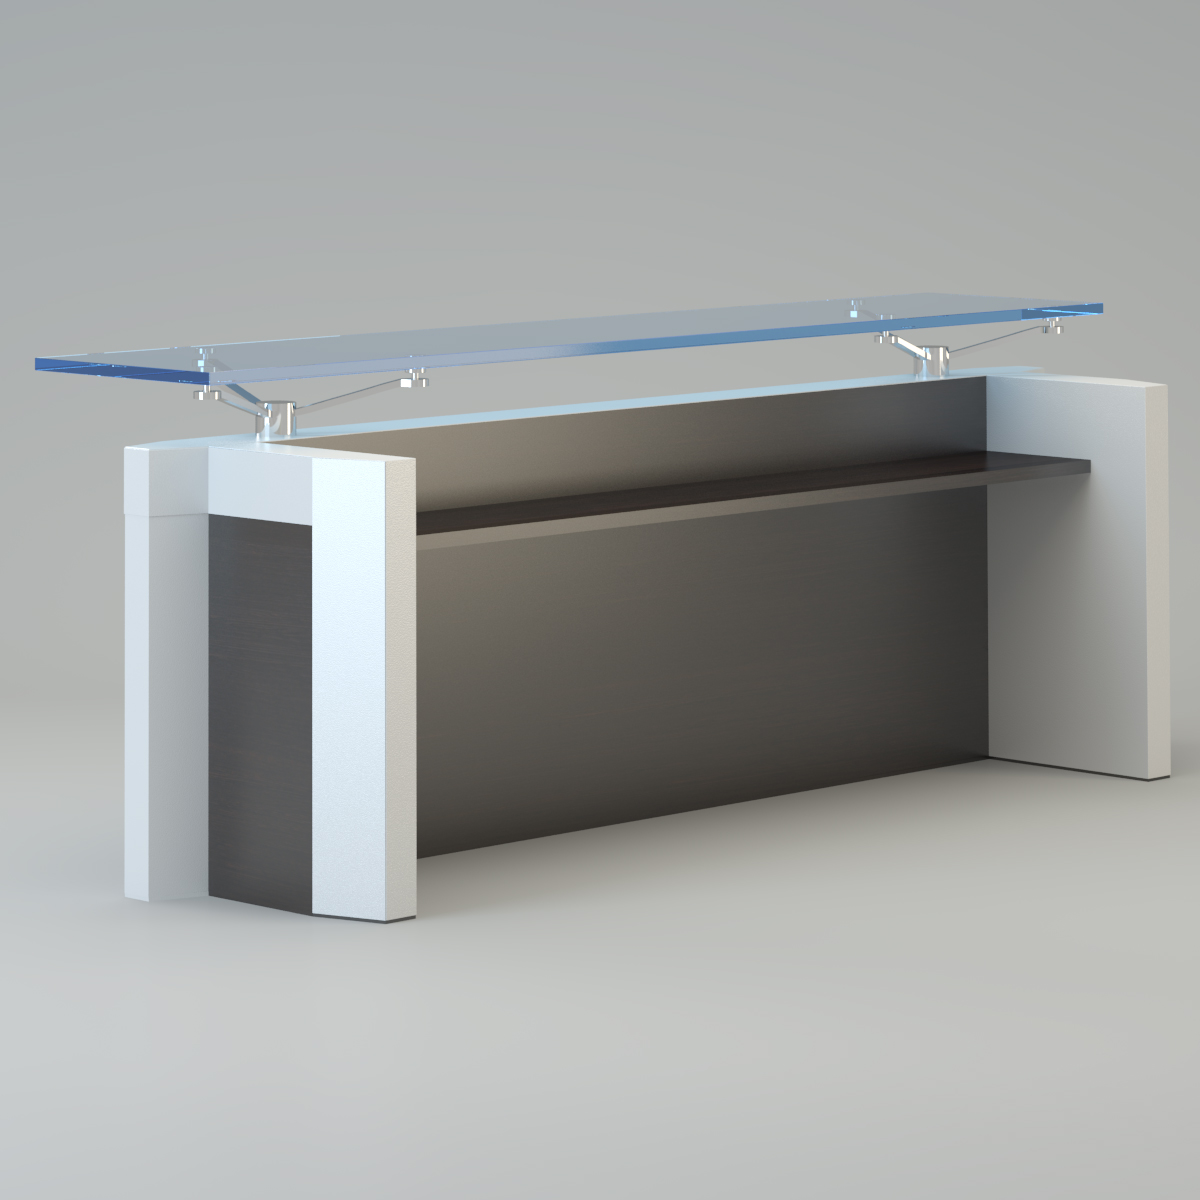 Contemporary Reception Desk Free 3d Model Max Cgtrader Com